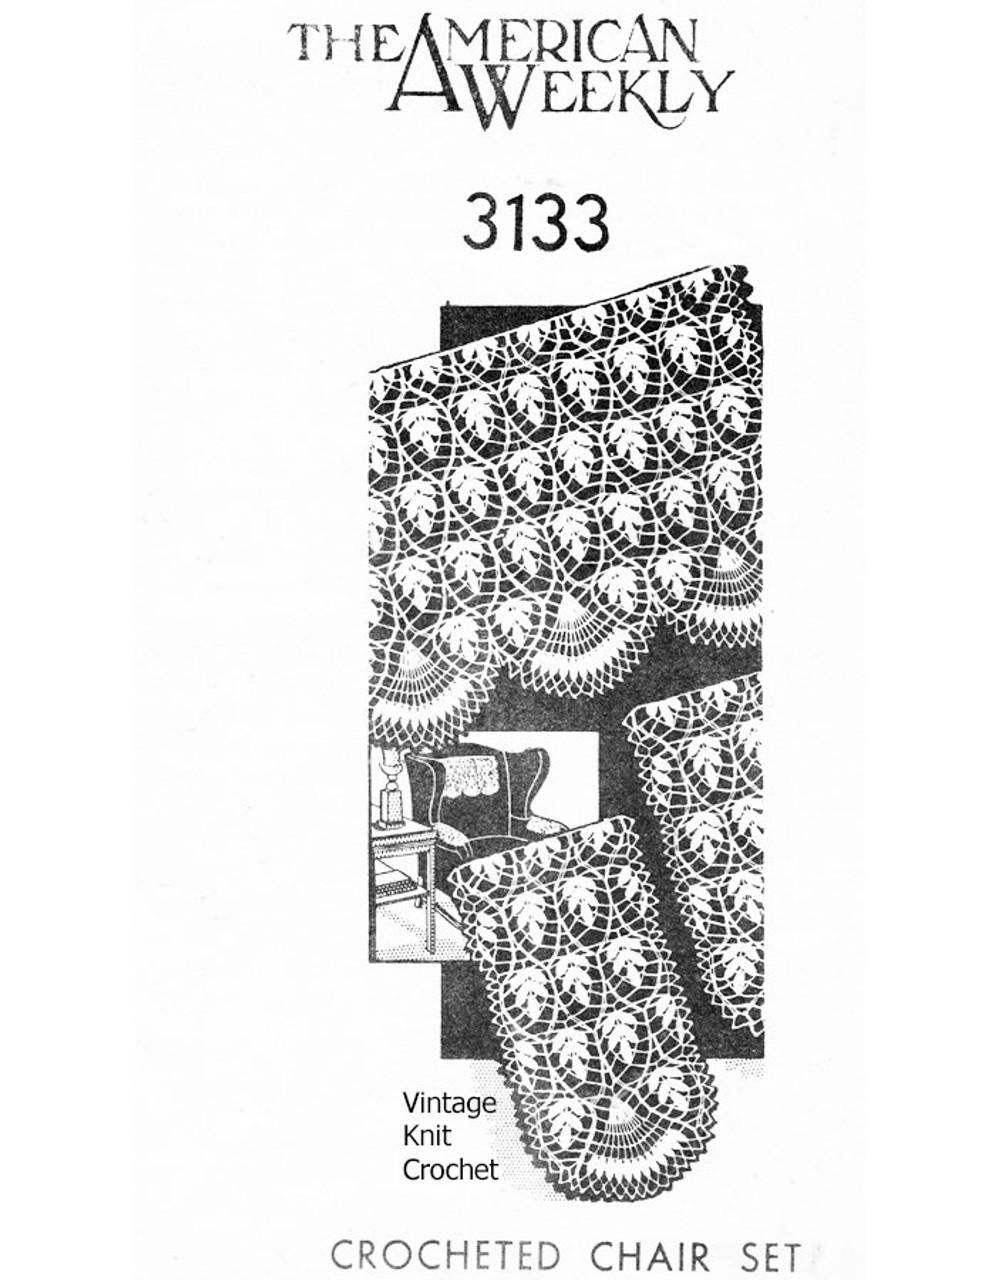 Vintage Fern Doily Crochet Pattern, Design 3133